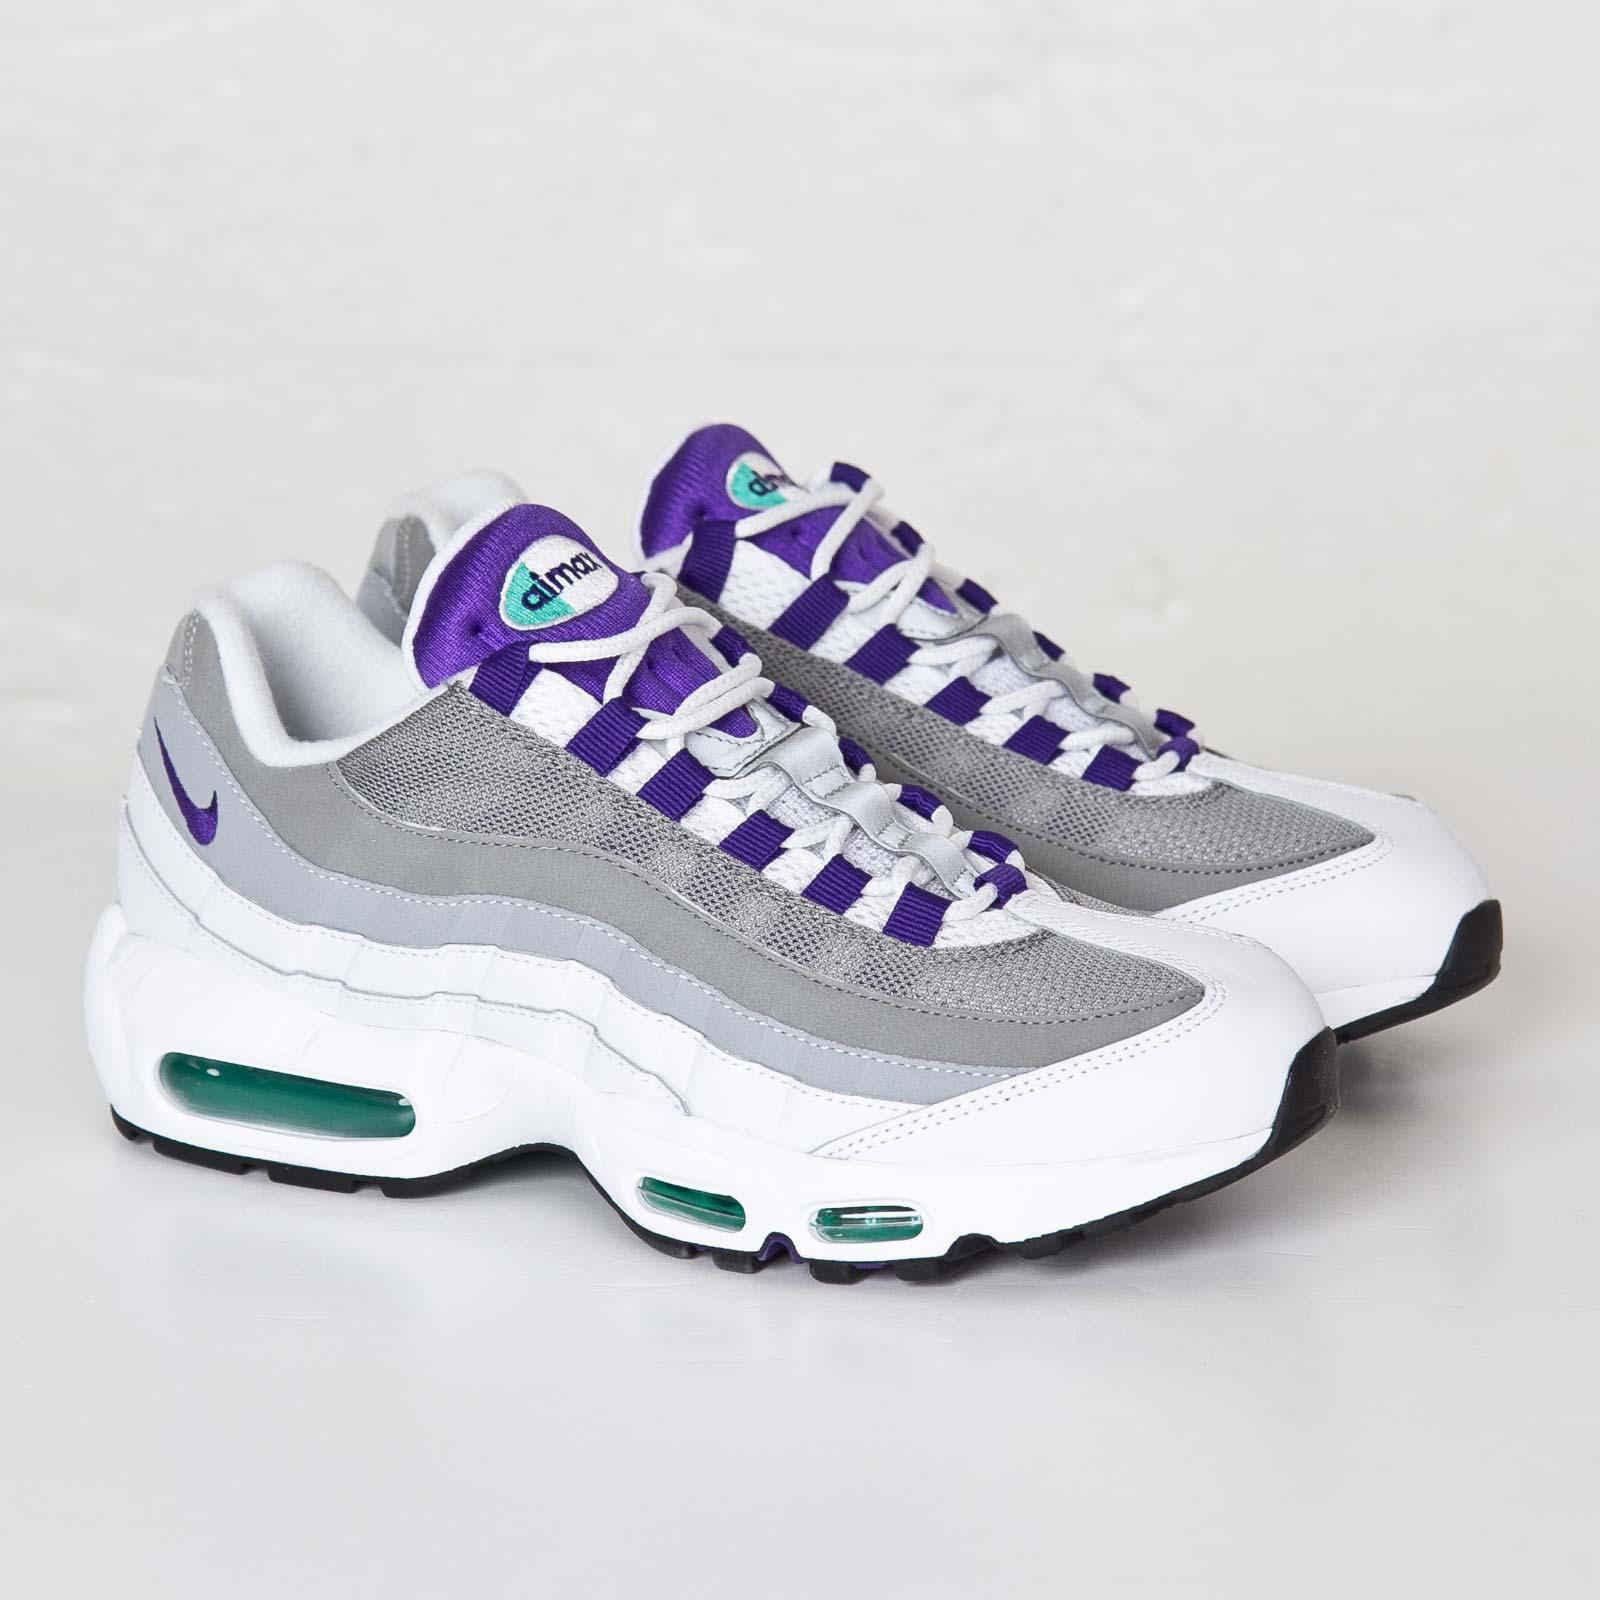 8fad3494080e Nike Air Max 95 OG - 554970-151 - Sneakersnstuff